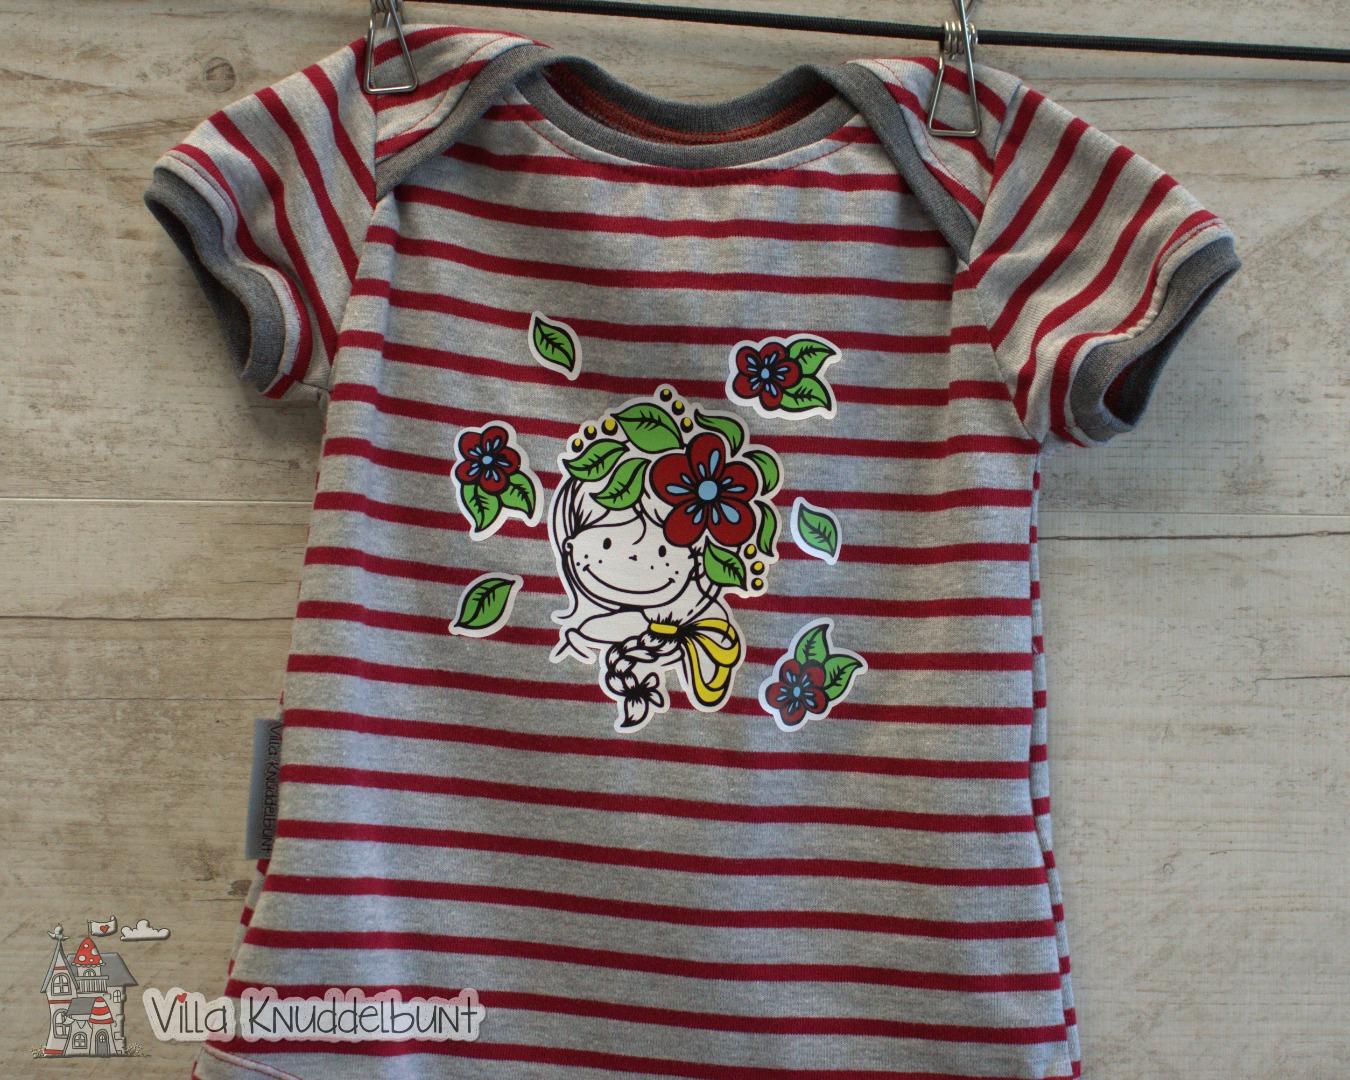 Sofortkauf Handmade Sommer T-Shirt Blumenmädchen Gr